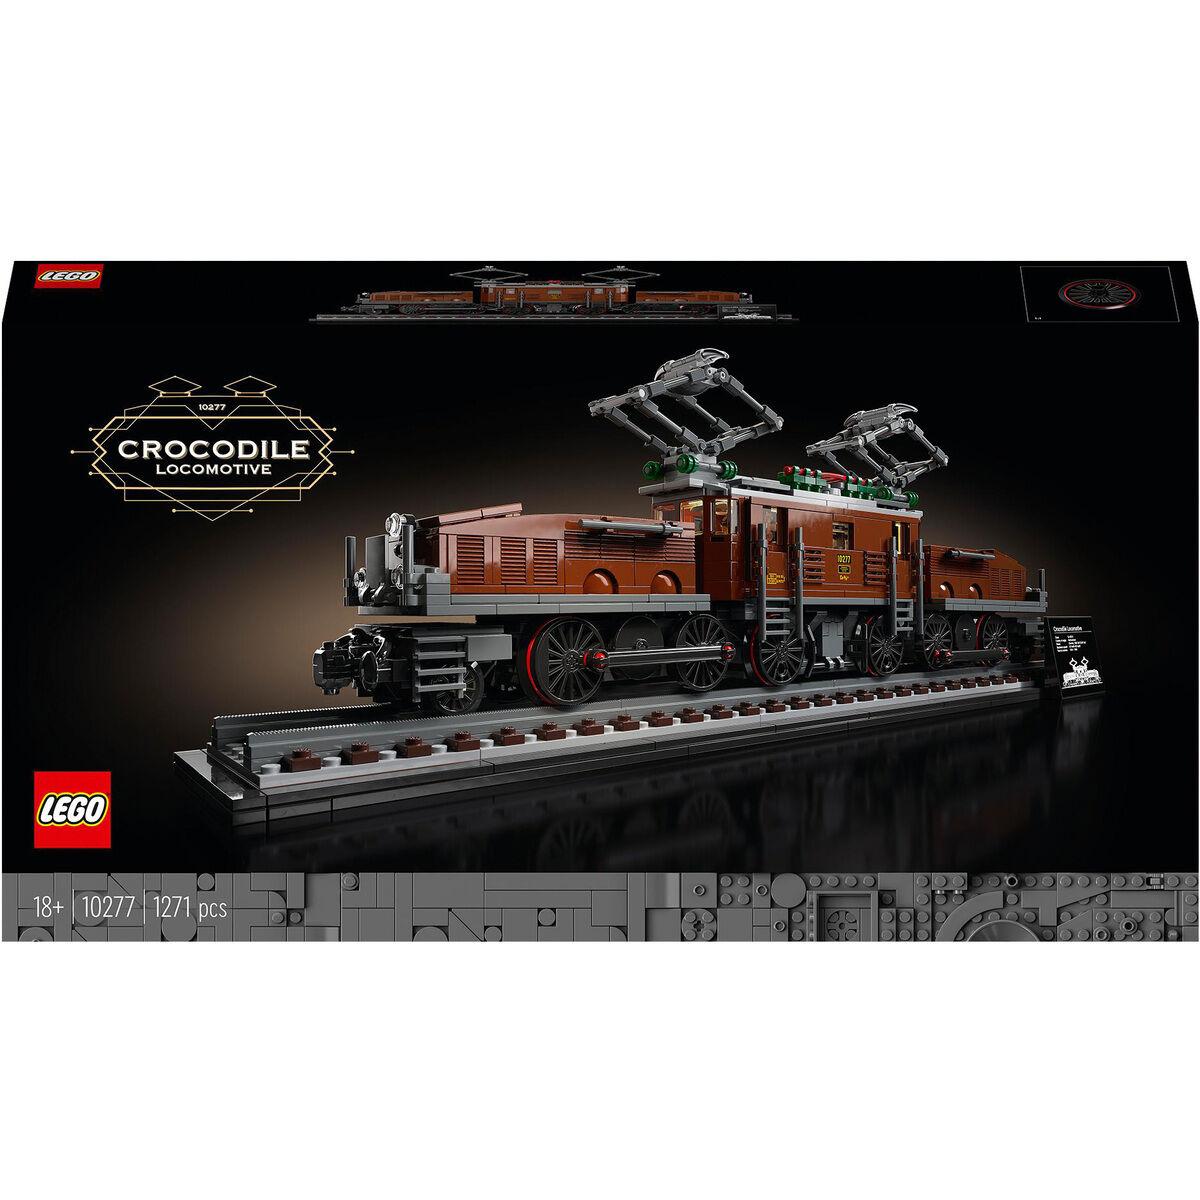 Lego Sammeldeal   ab 50€ 15€ sparen! : z.B. 10277 Lokomotive Krokodil ~79 €   10280 Blumenstrauß 10281 Bonsai Baum je 37€[Galeria Kaufhof]